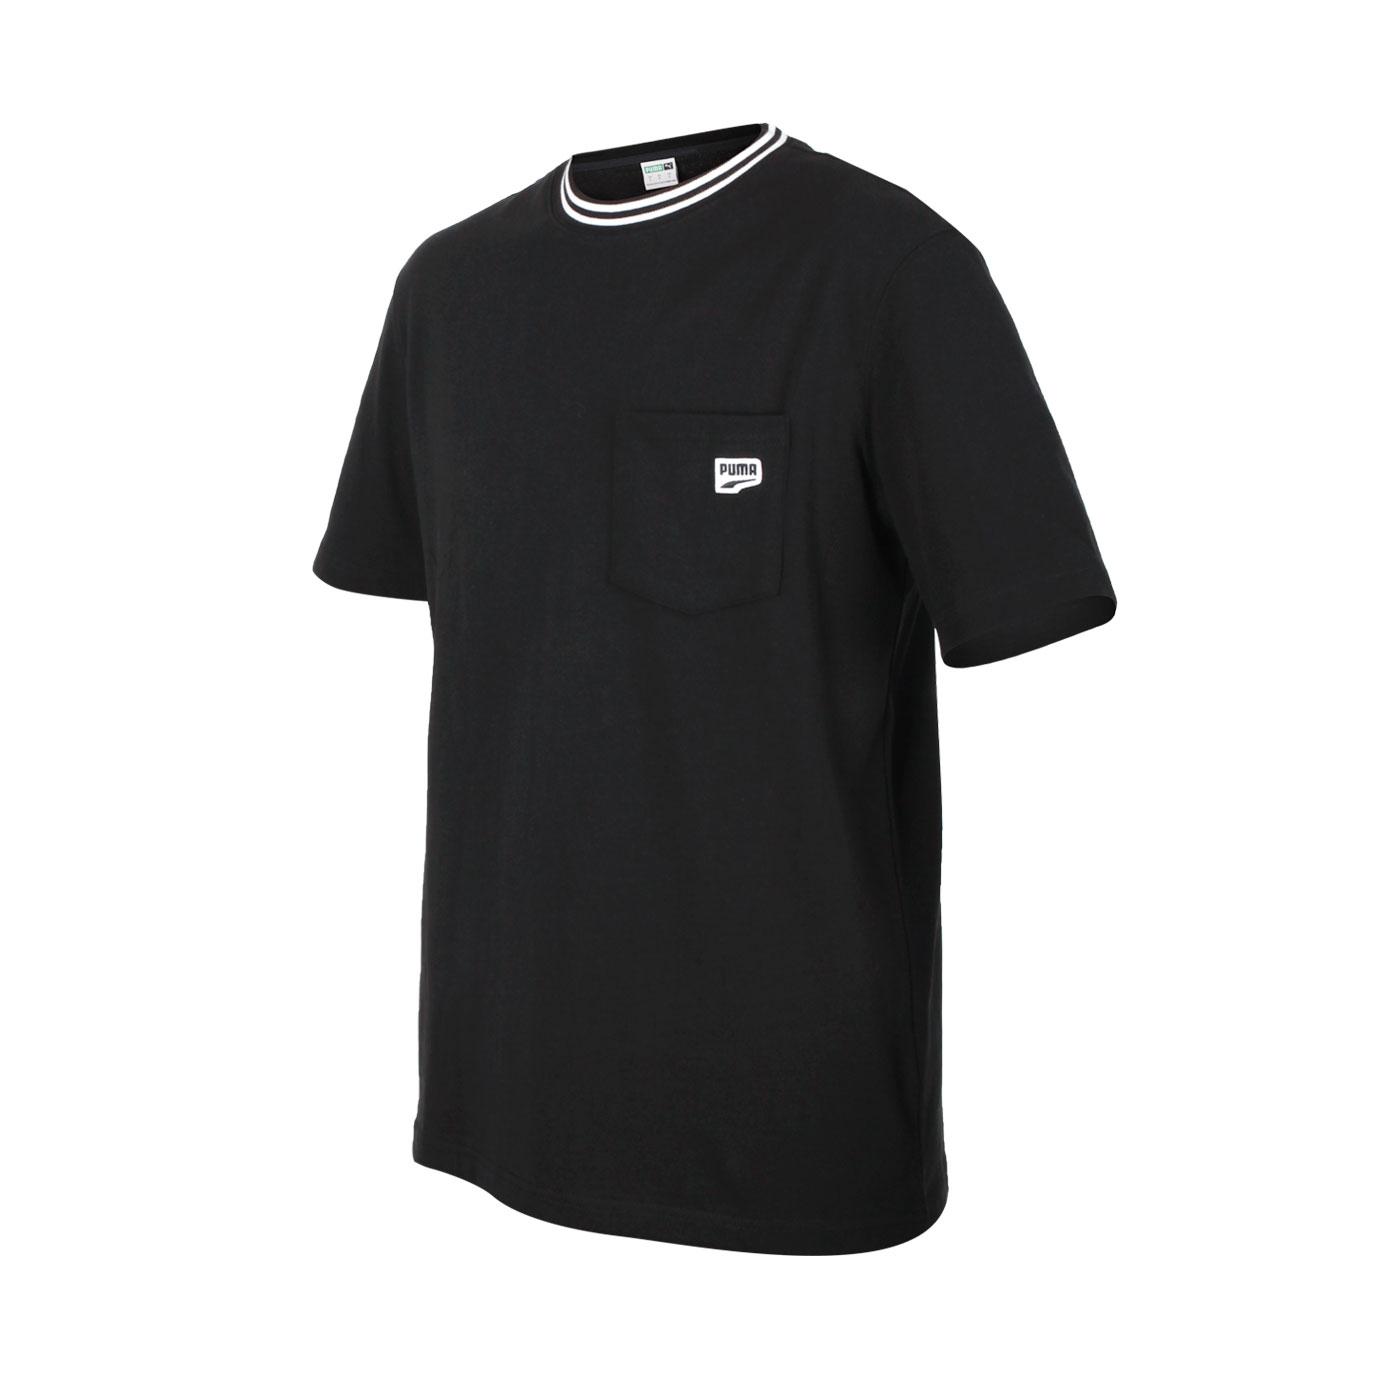 PUMA 男款Down town口袋短袖T恤 53143201 - 黑白